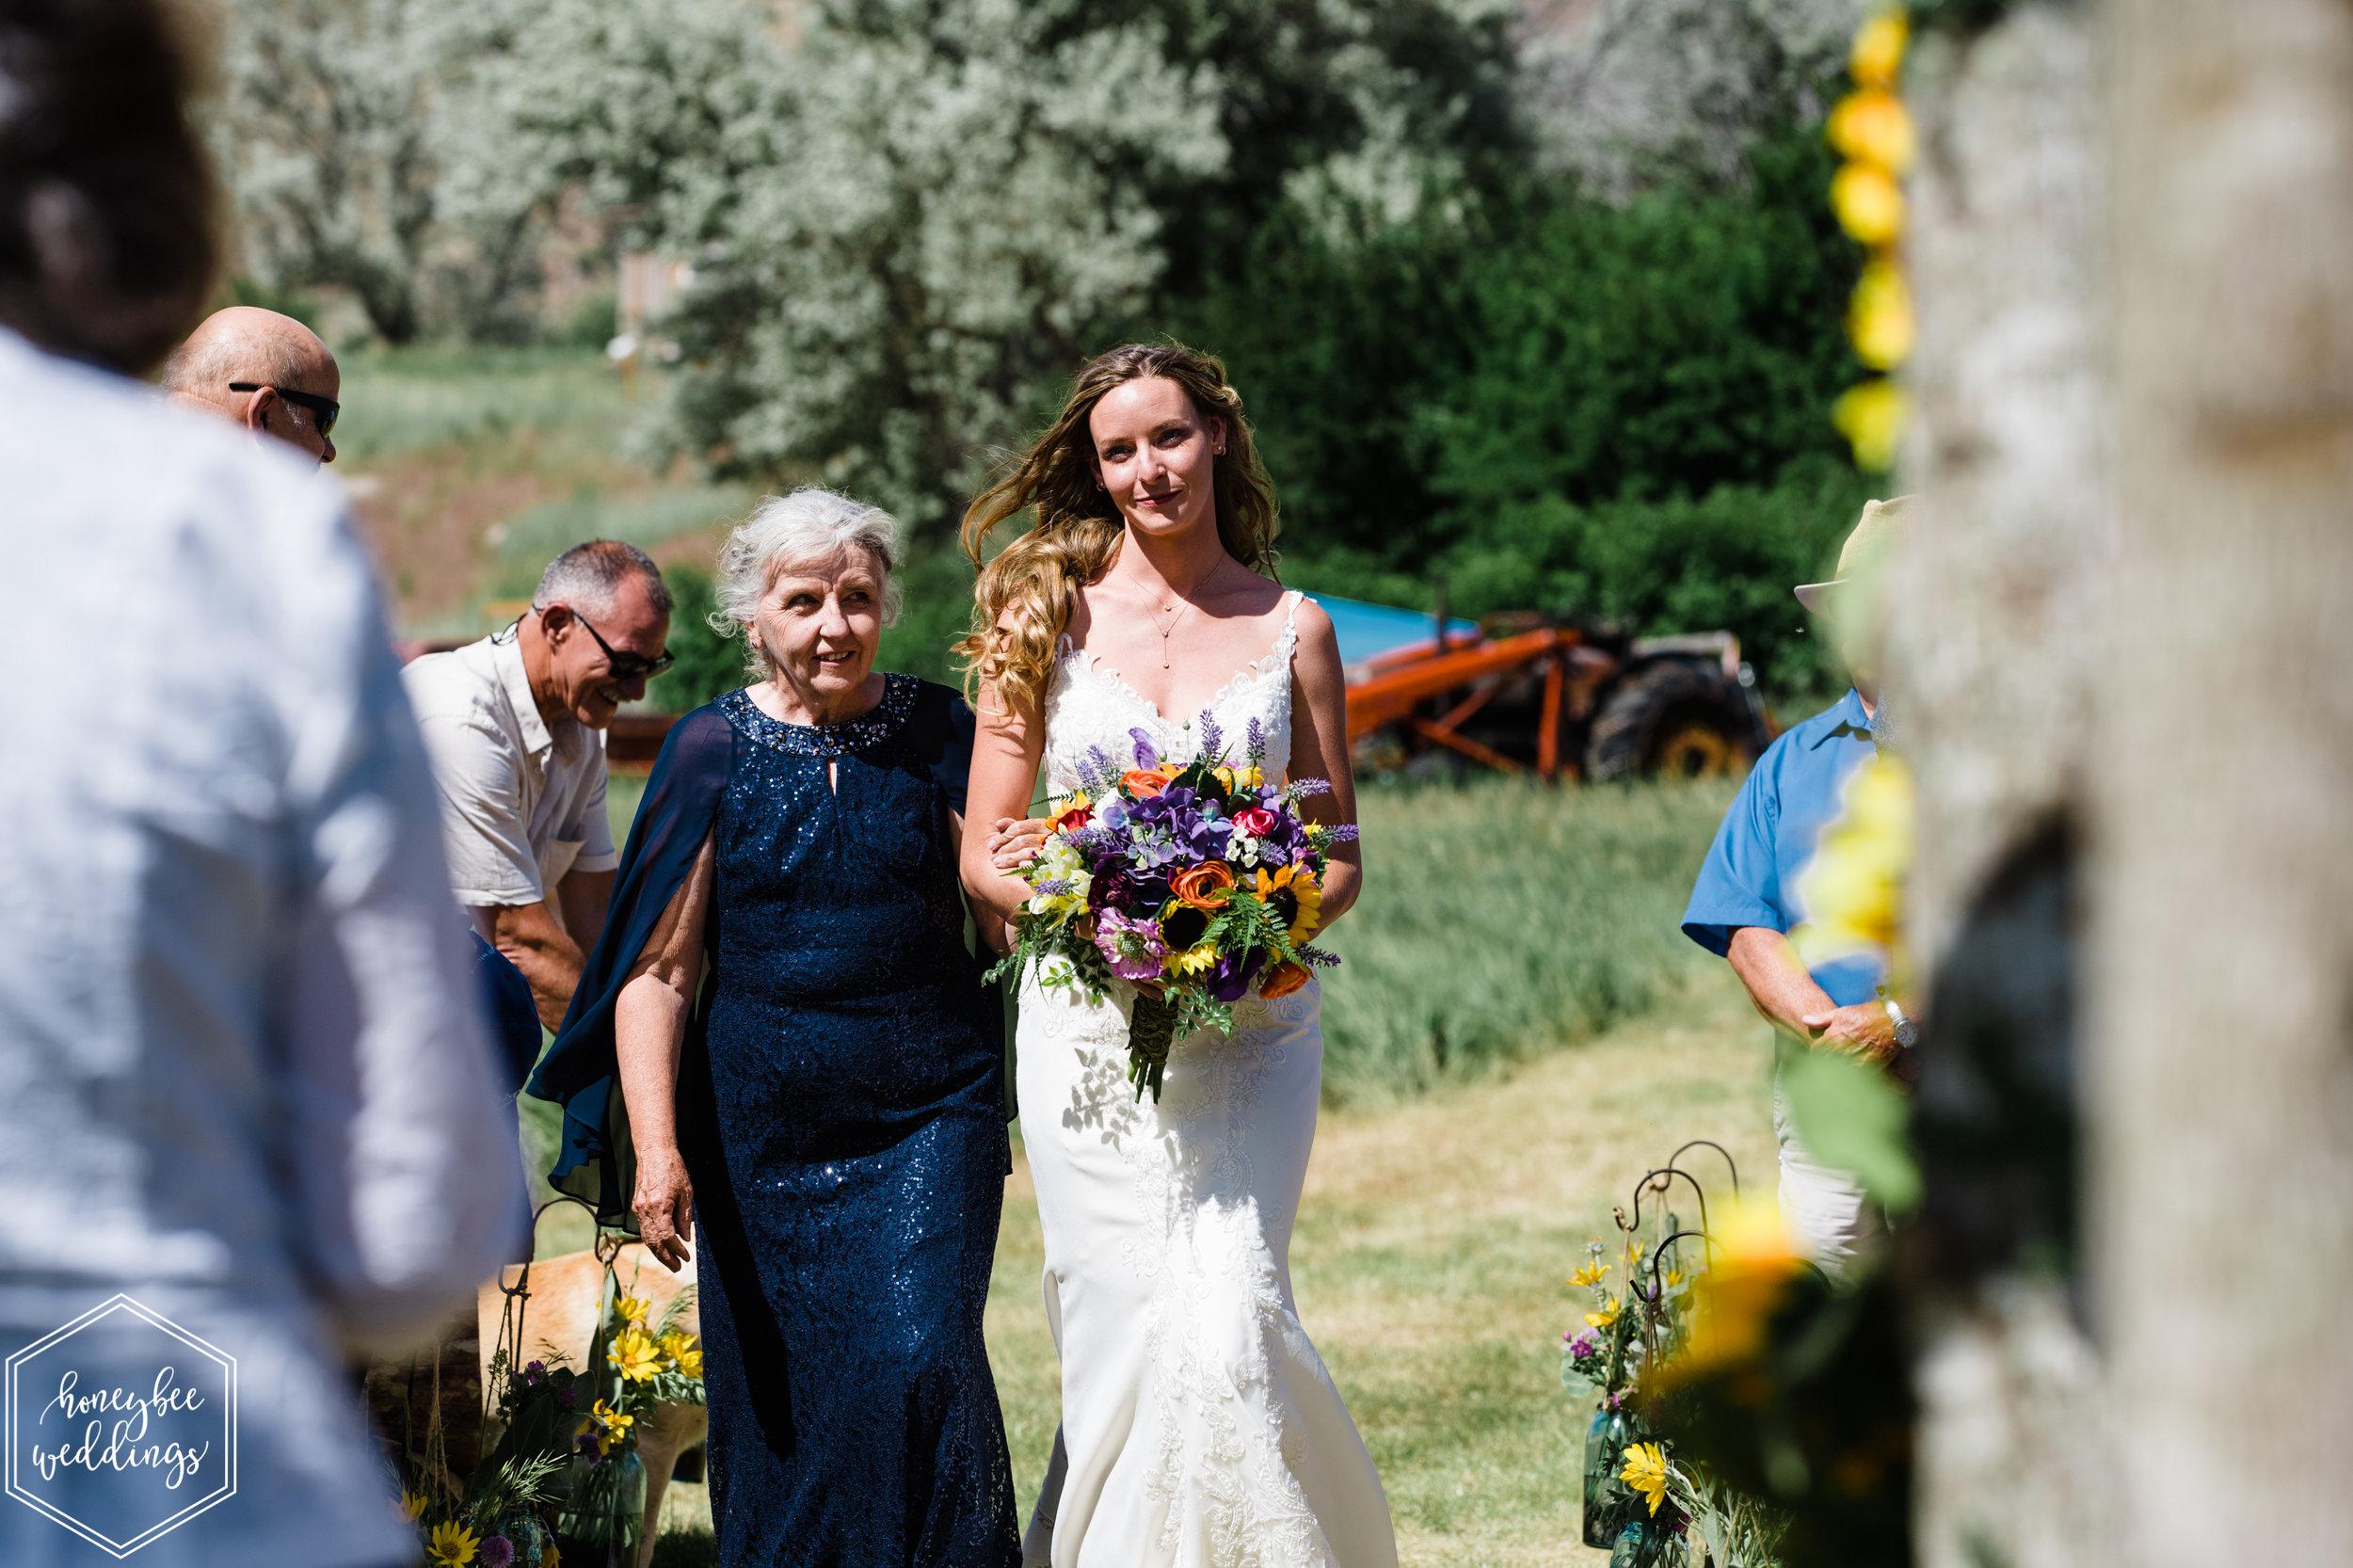 037Yellowstone National Park Wedding_Montana Wedding Photographer_Honeybee Weddings_Shannon & Jonathan_June 29, 2019-1378.jpg